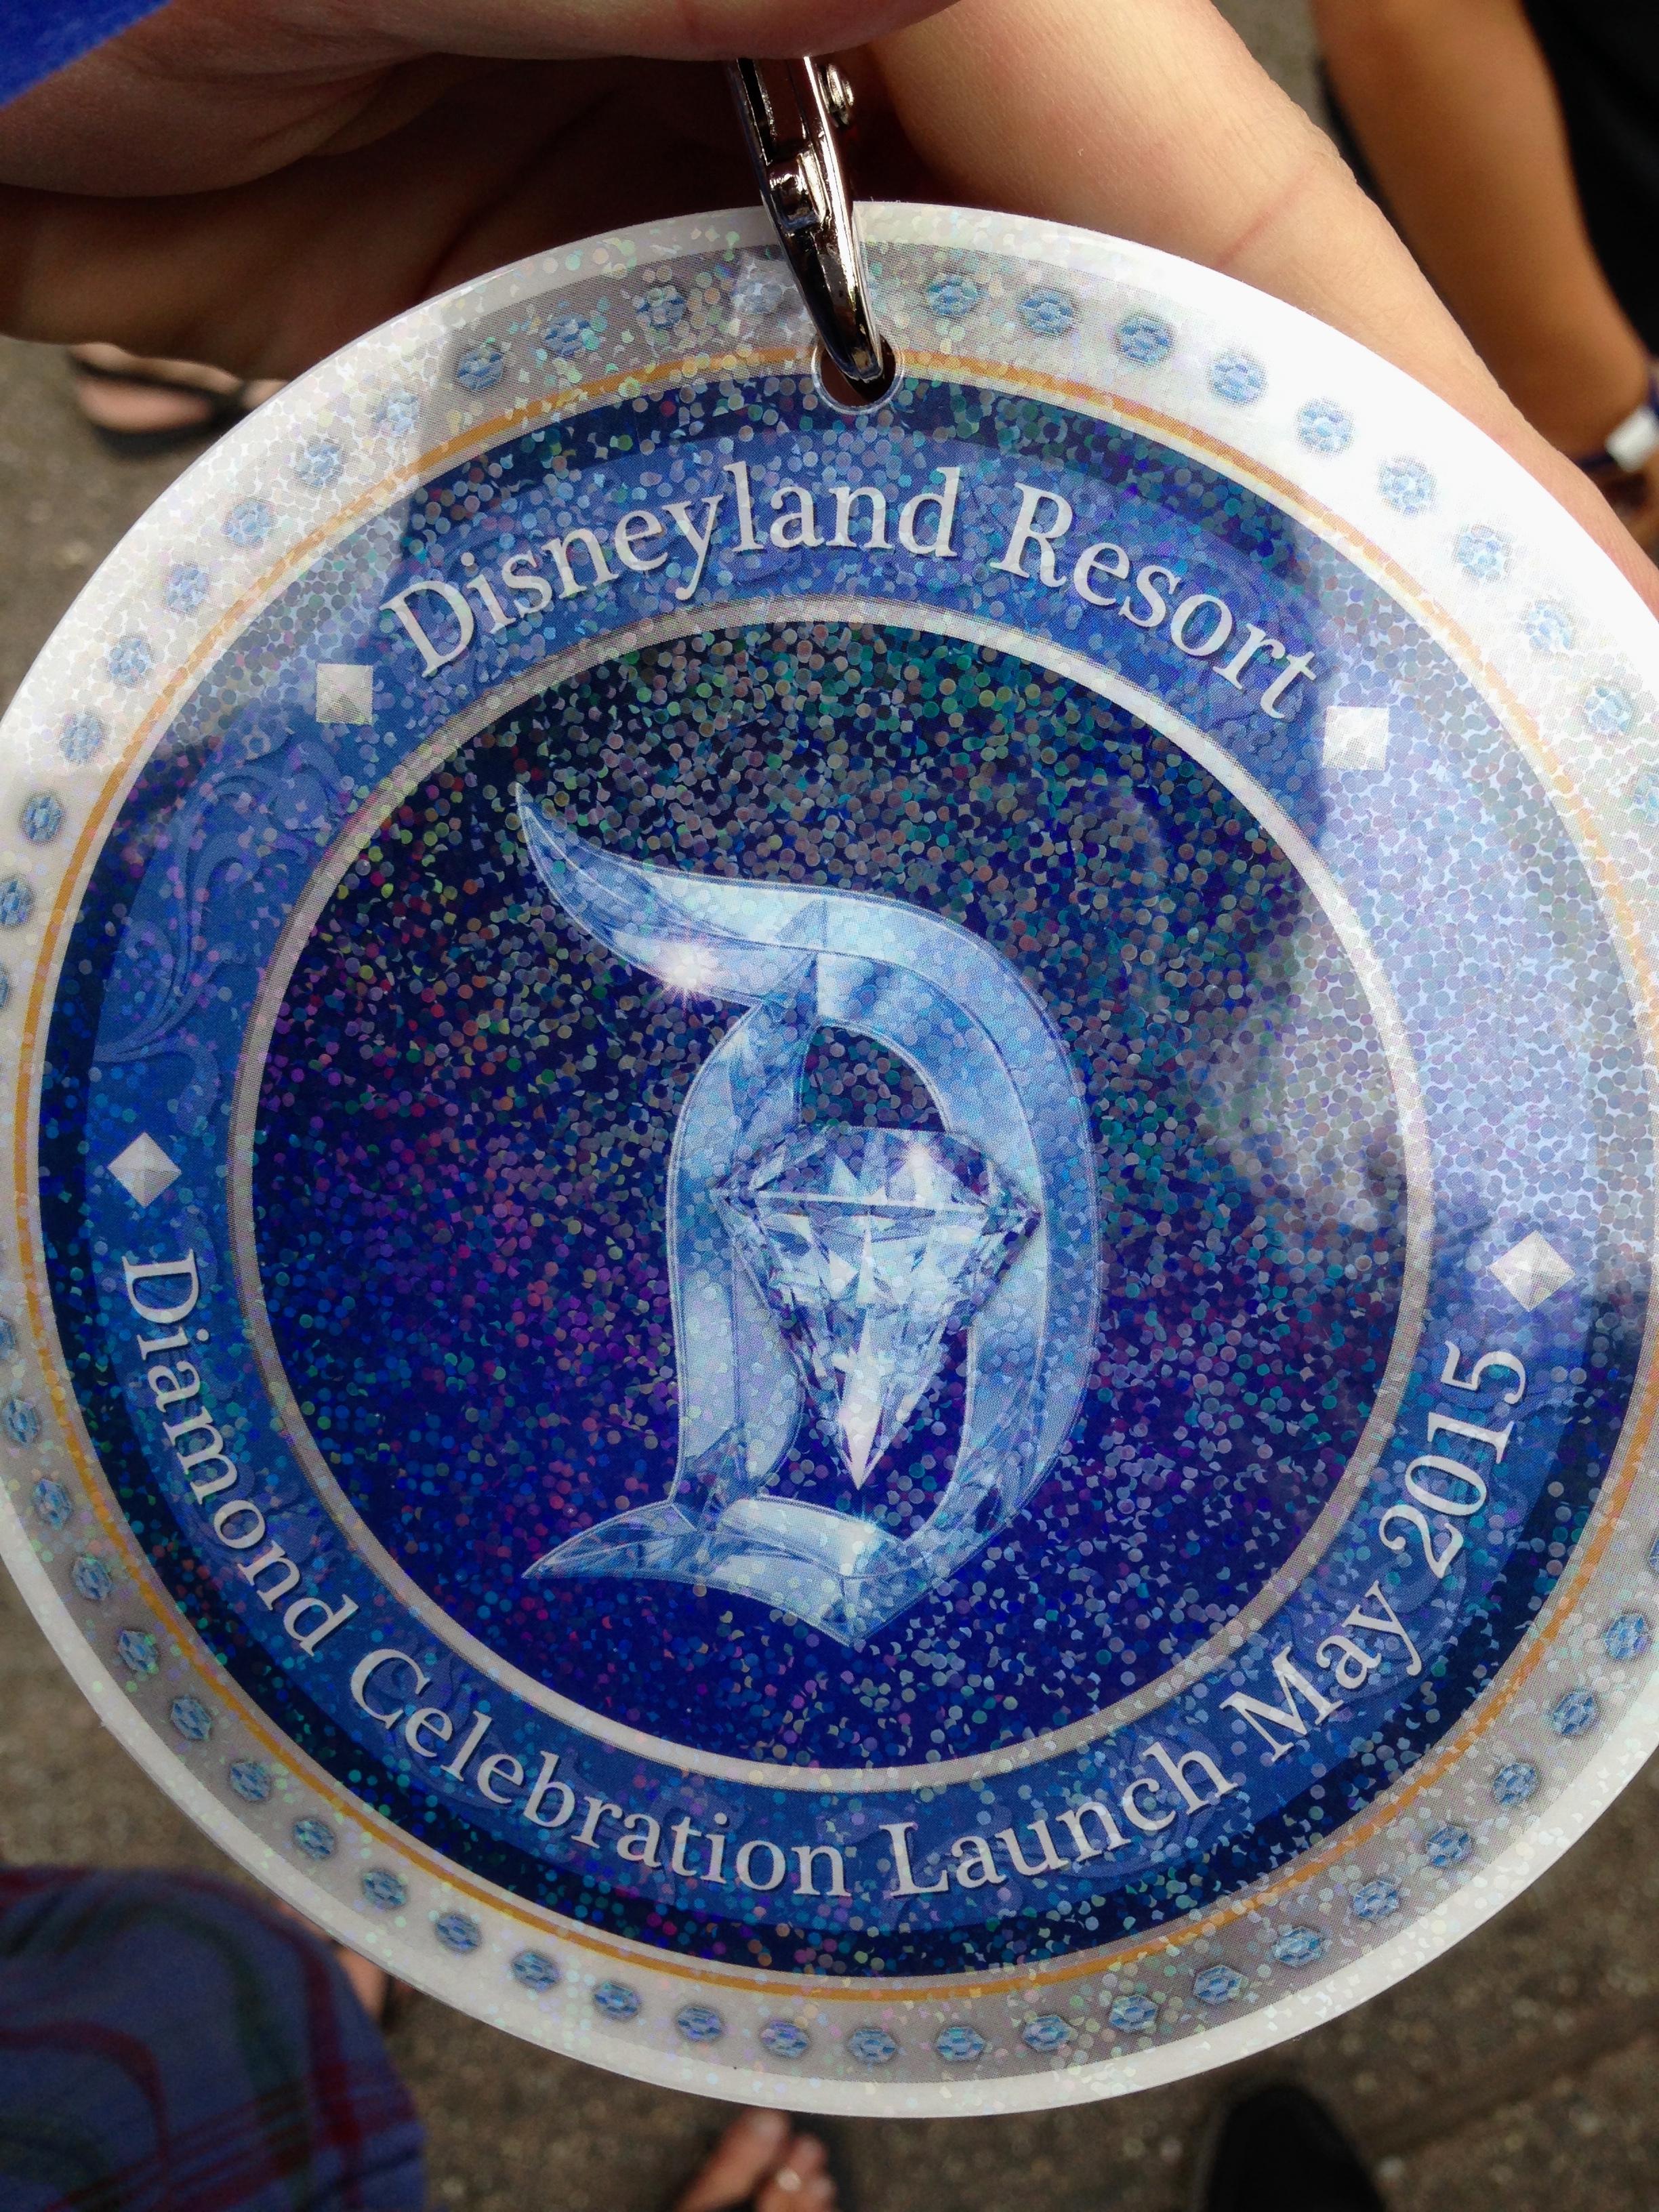 Disneyland Diamond Celebration: What's new